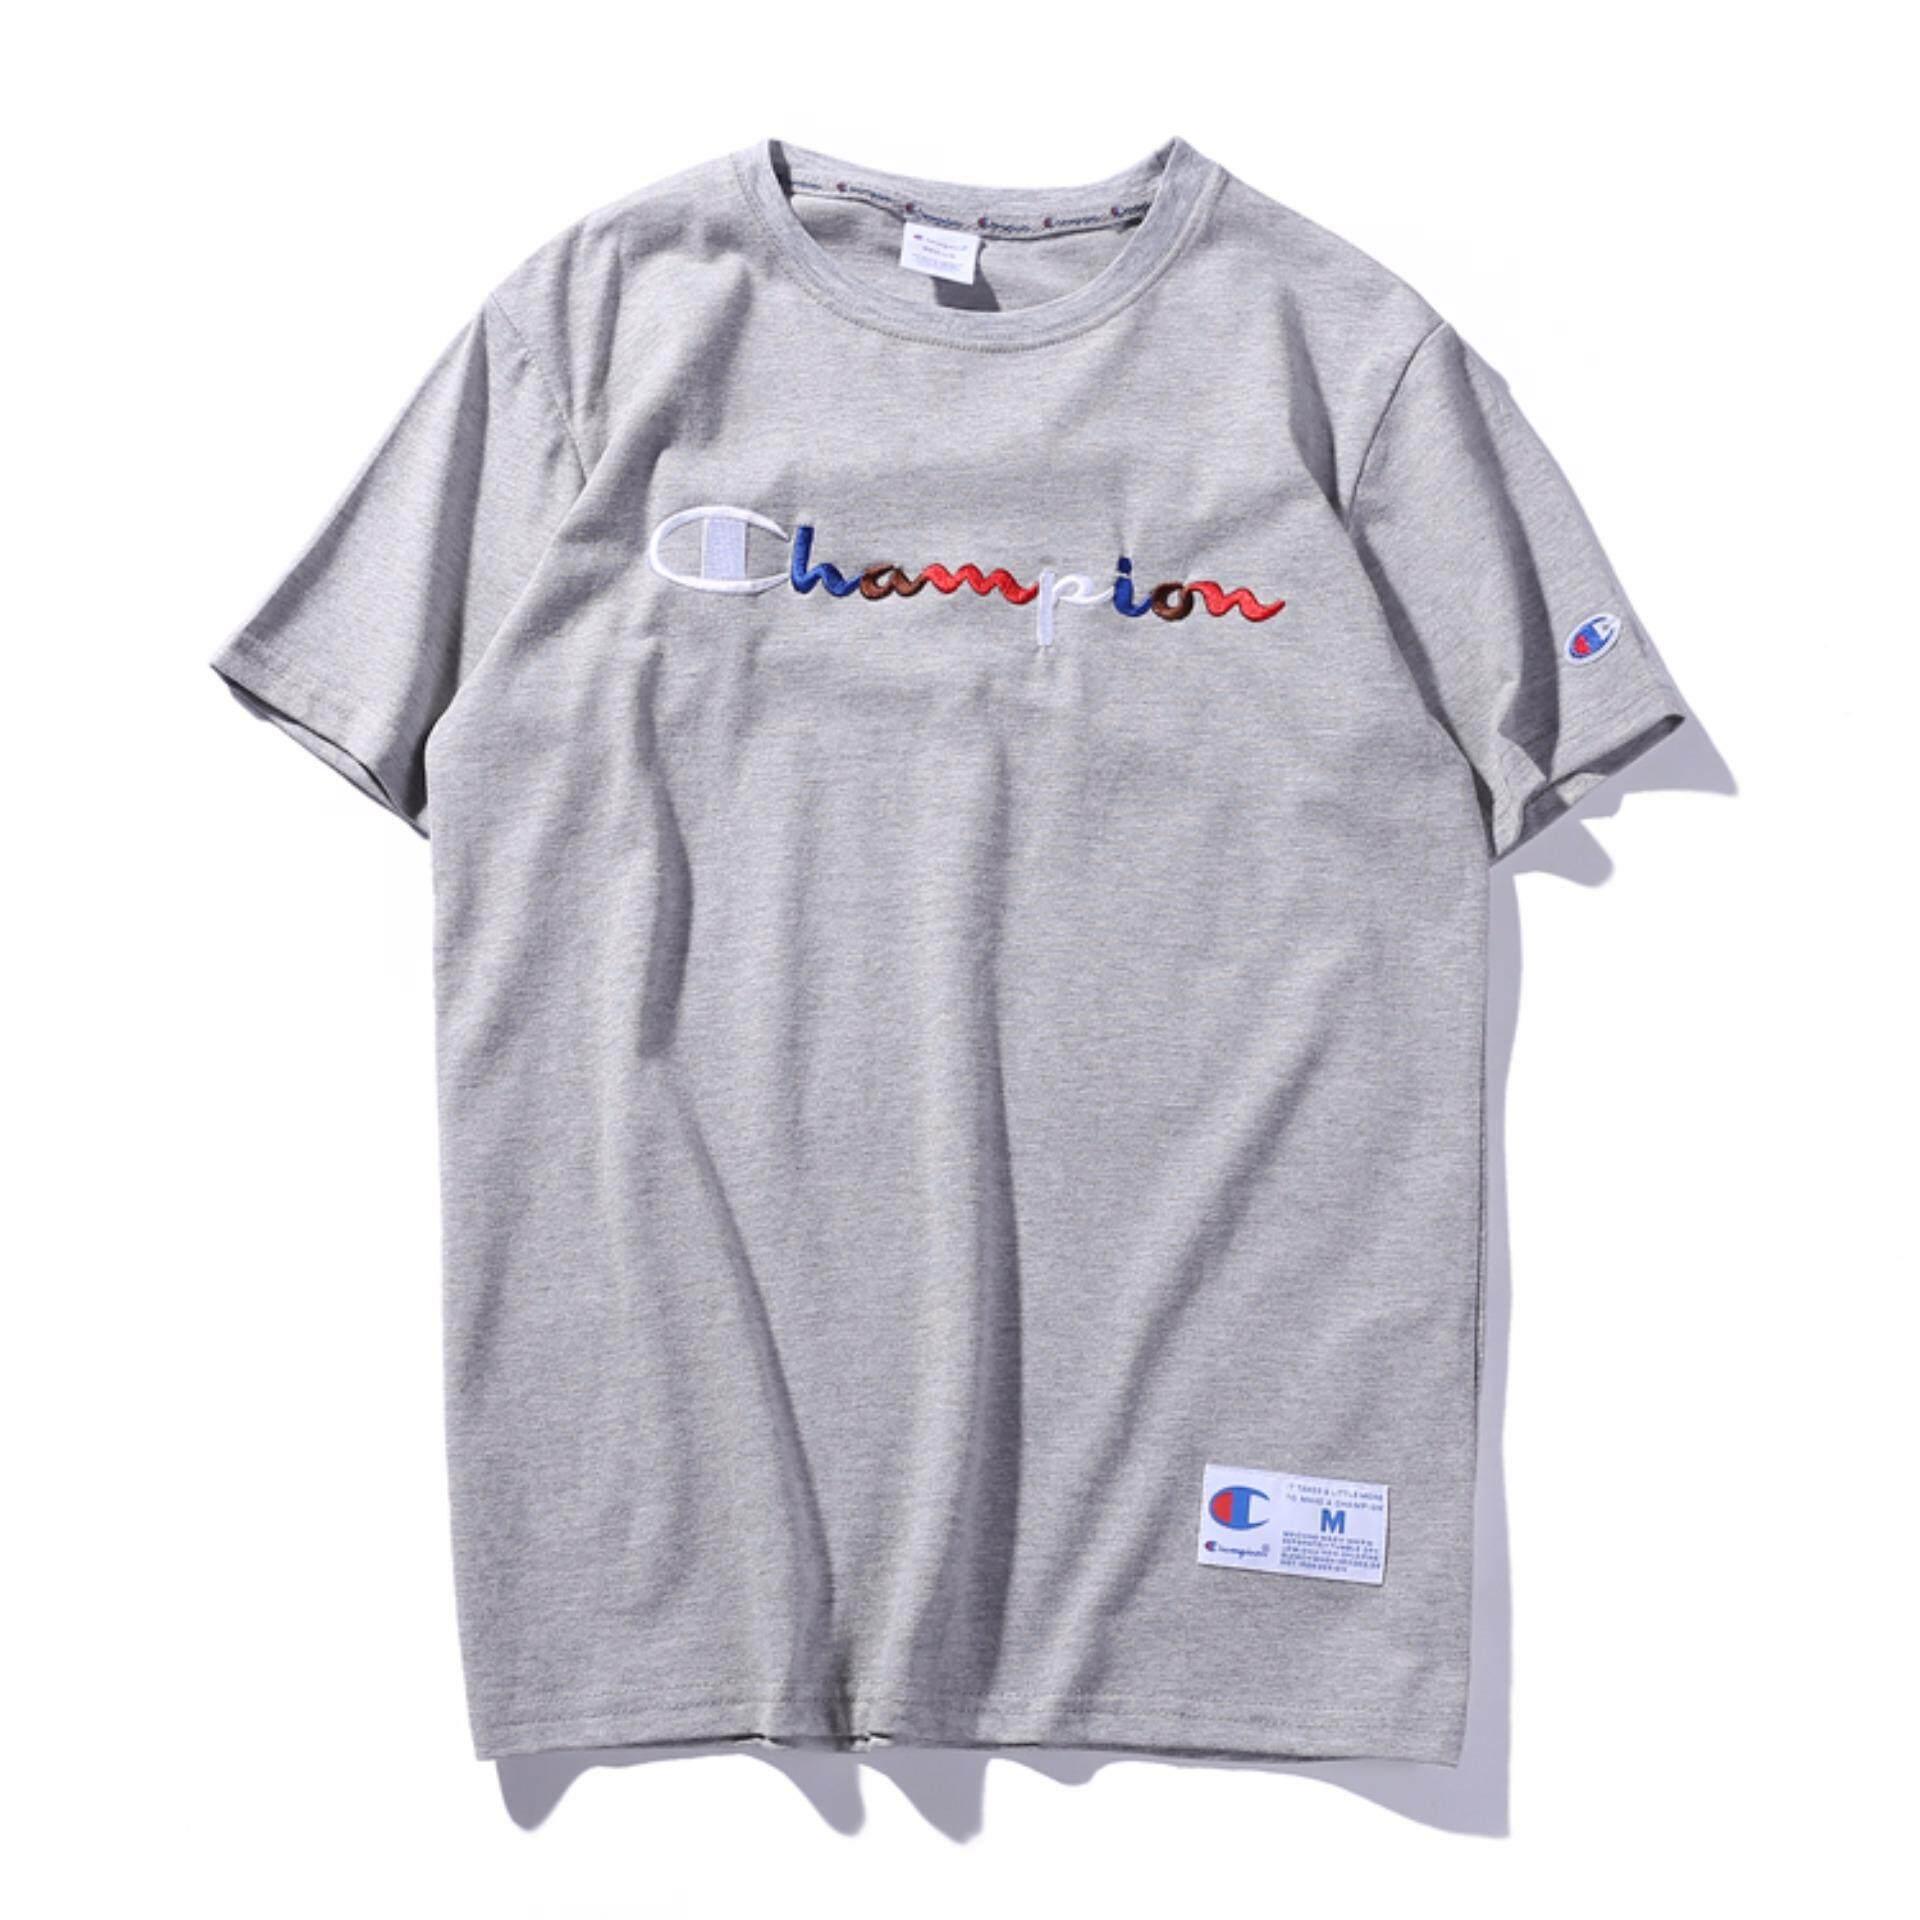 Fitur Kaos Polos Katun Bambu Xxl Cotton Bamboo T Shirt O Neck Teal Solid Bigdata Store Fashion Mens Round Champion Short Sleeves